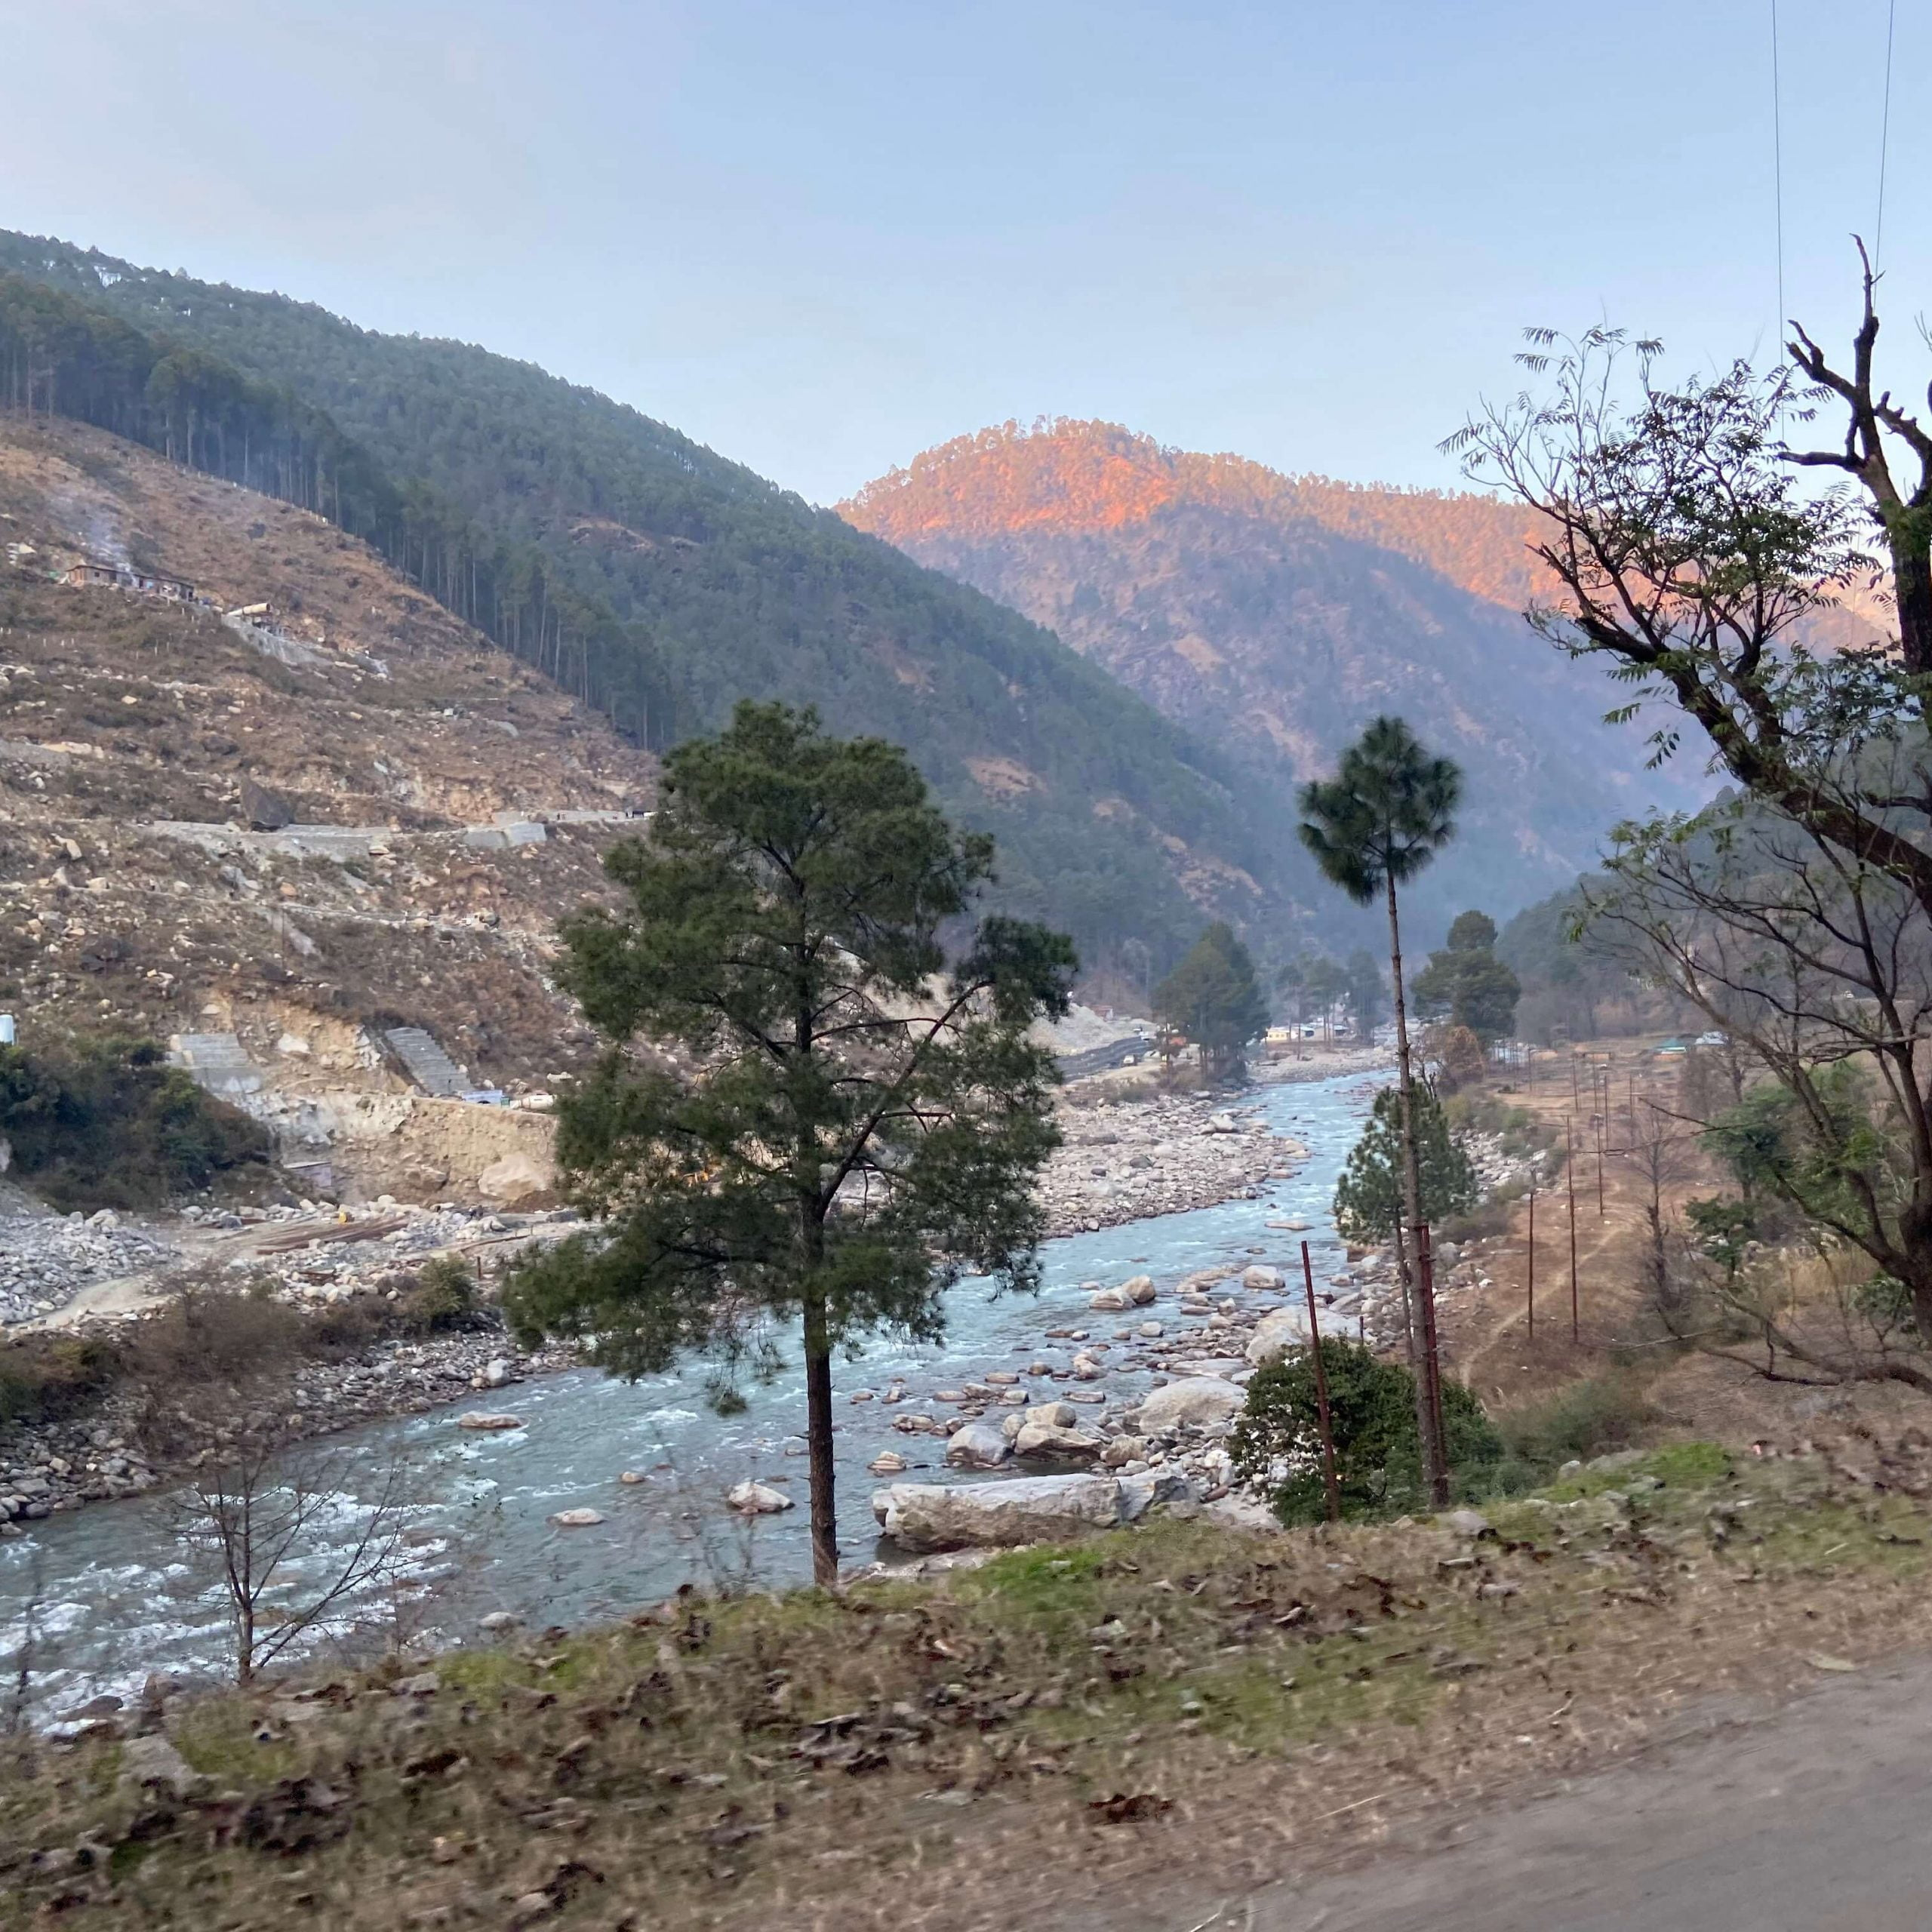 Day 1 - Dehradun to Sankri